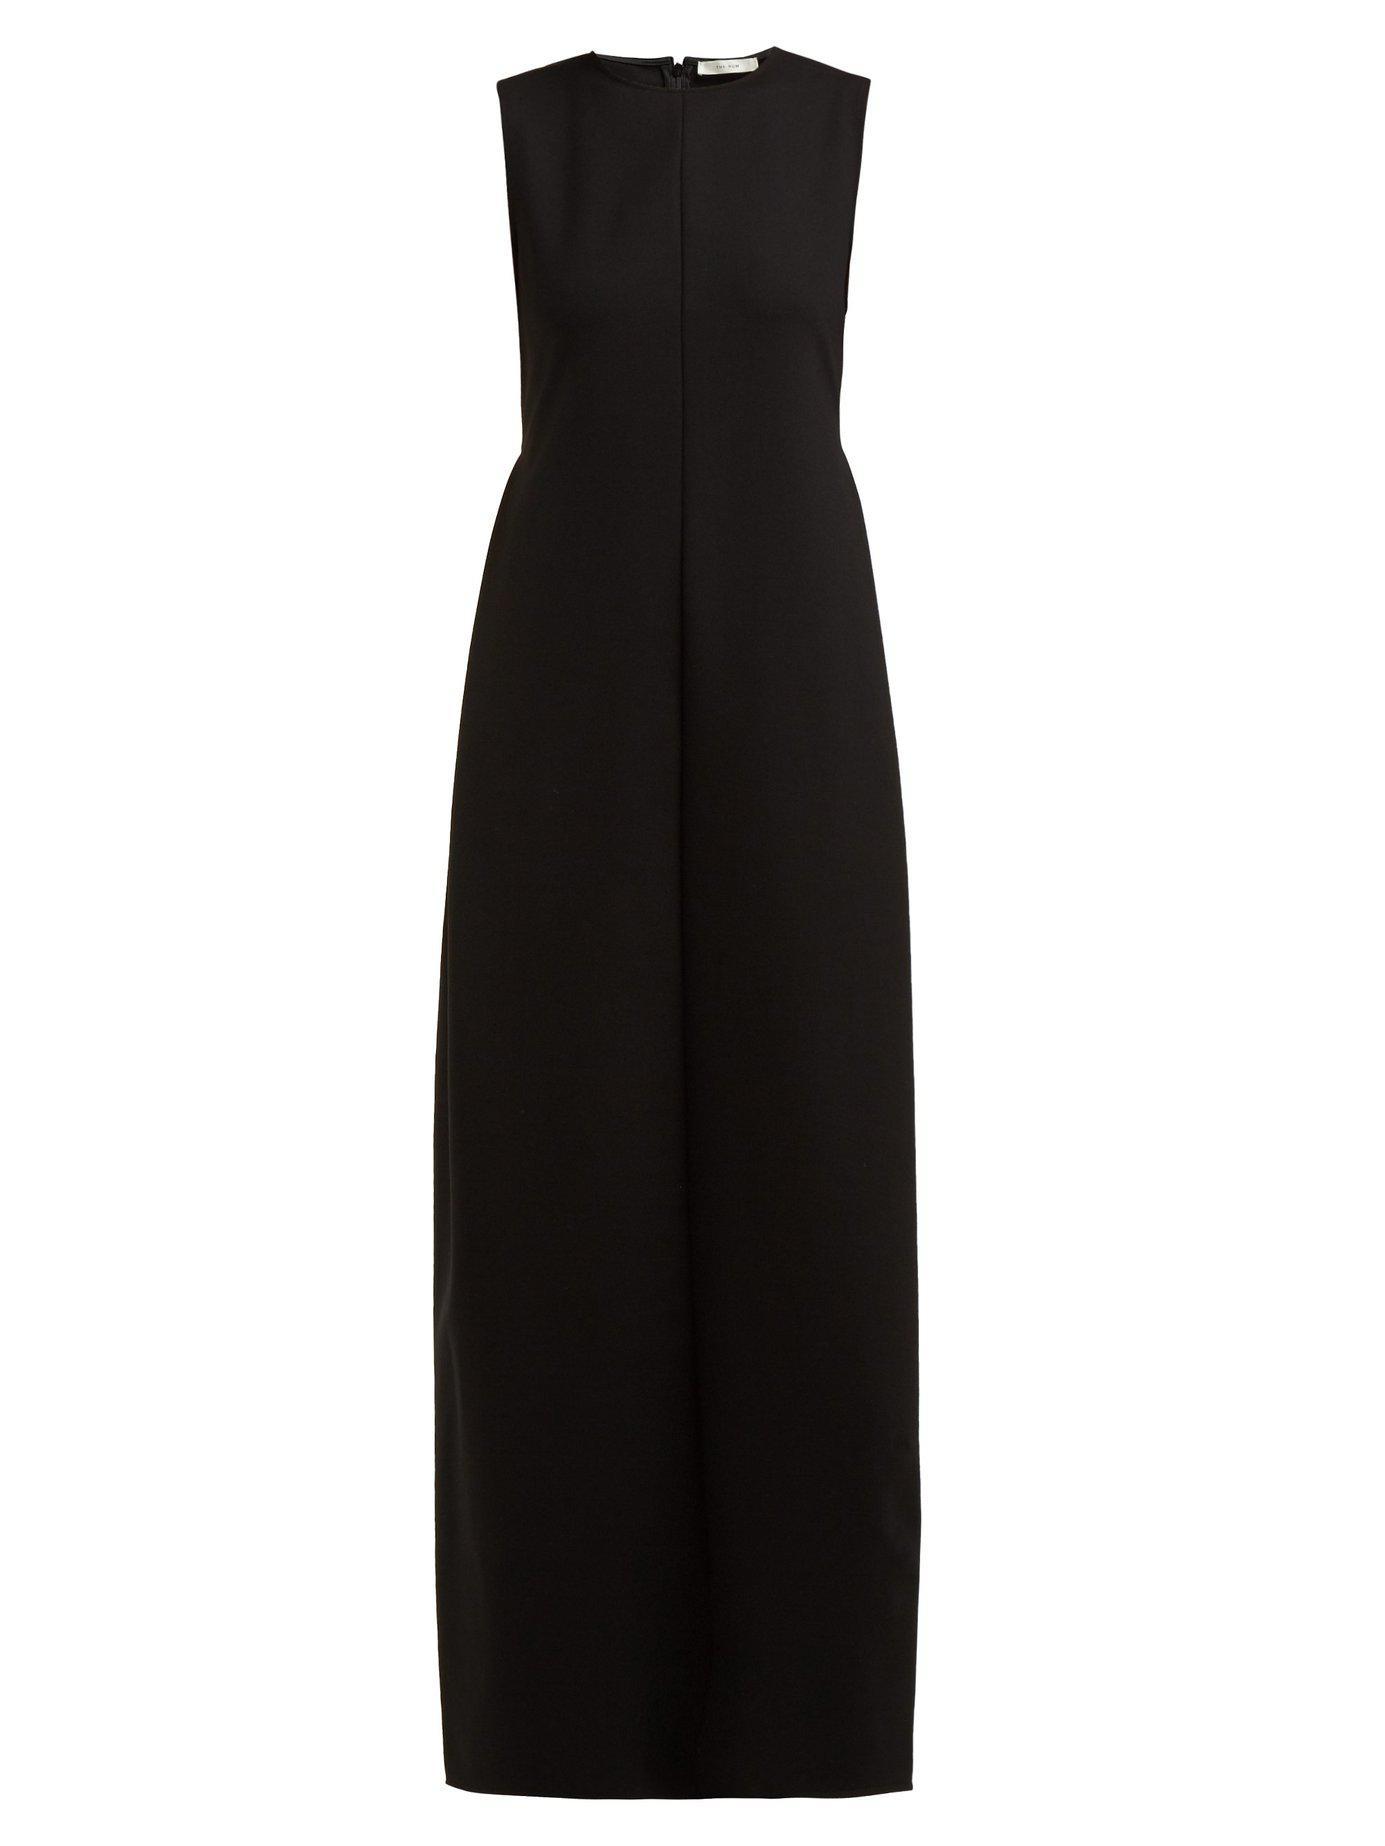 597bc581e6679 Lyst - The Row Ianni Maxi Dress in Black